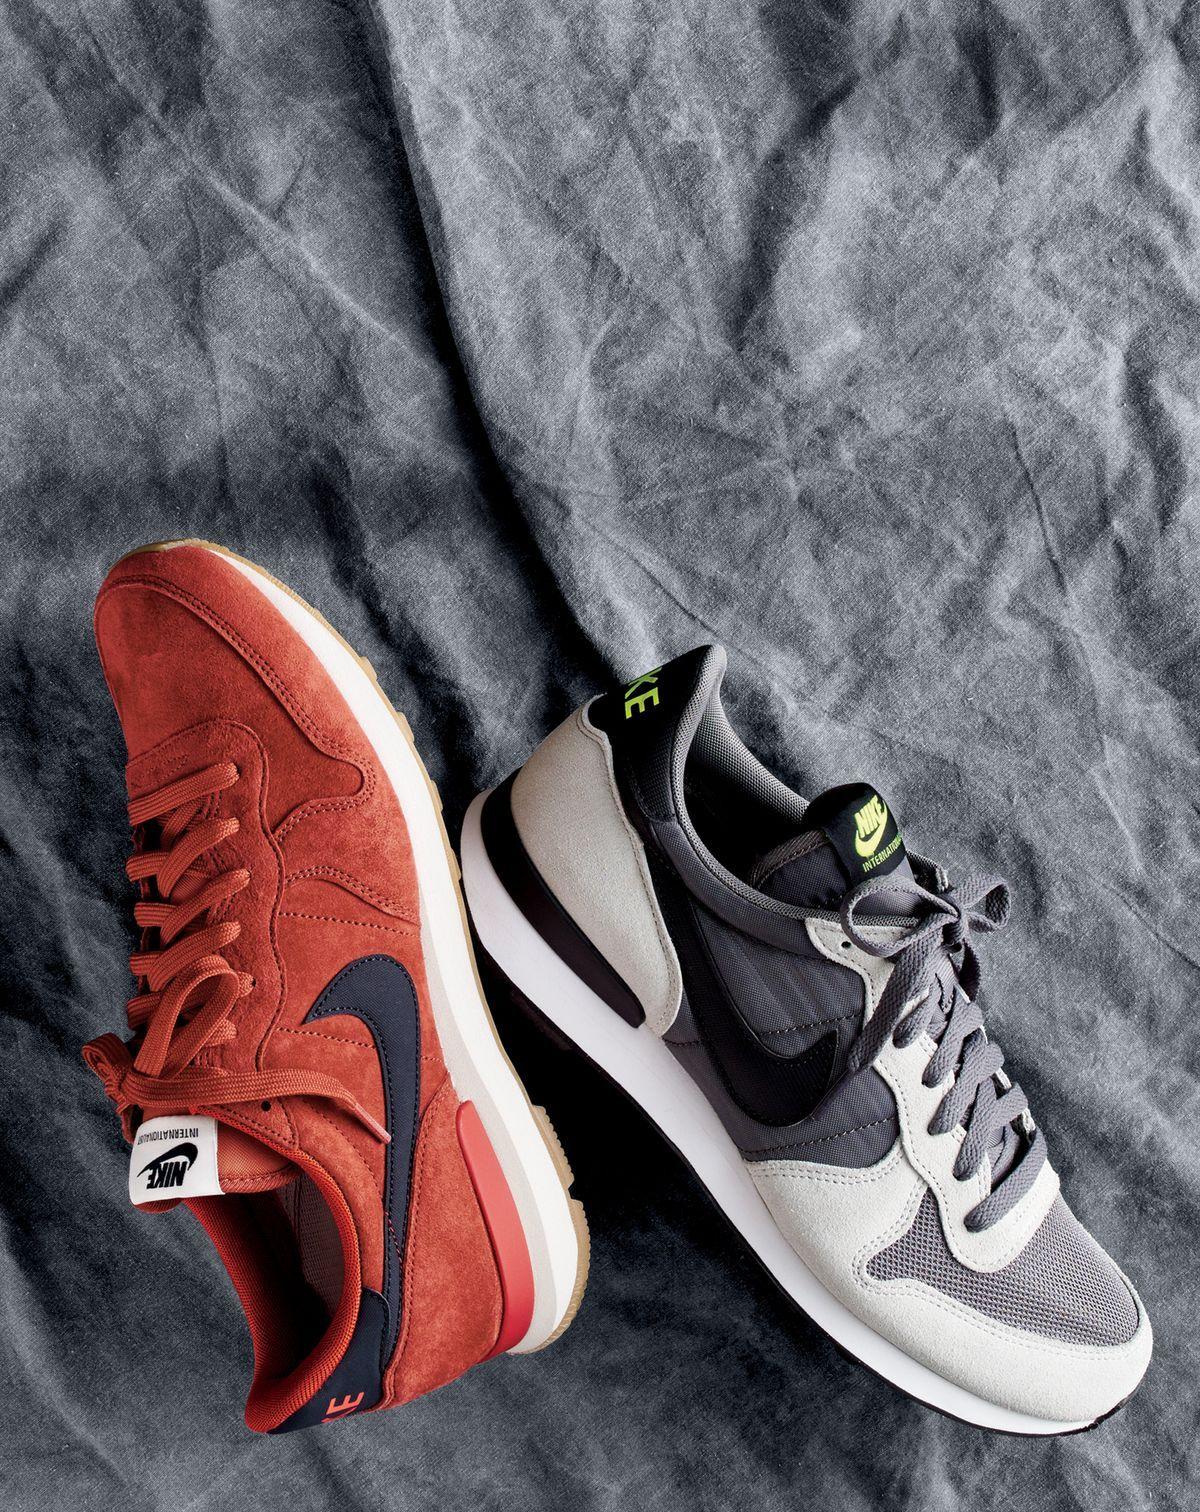 Sneakers men fashion, Nike internationalist